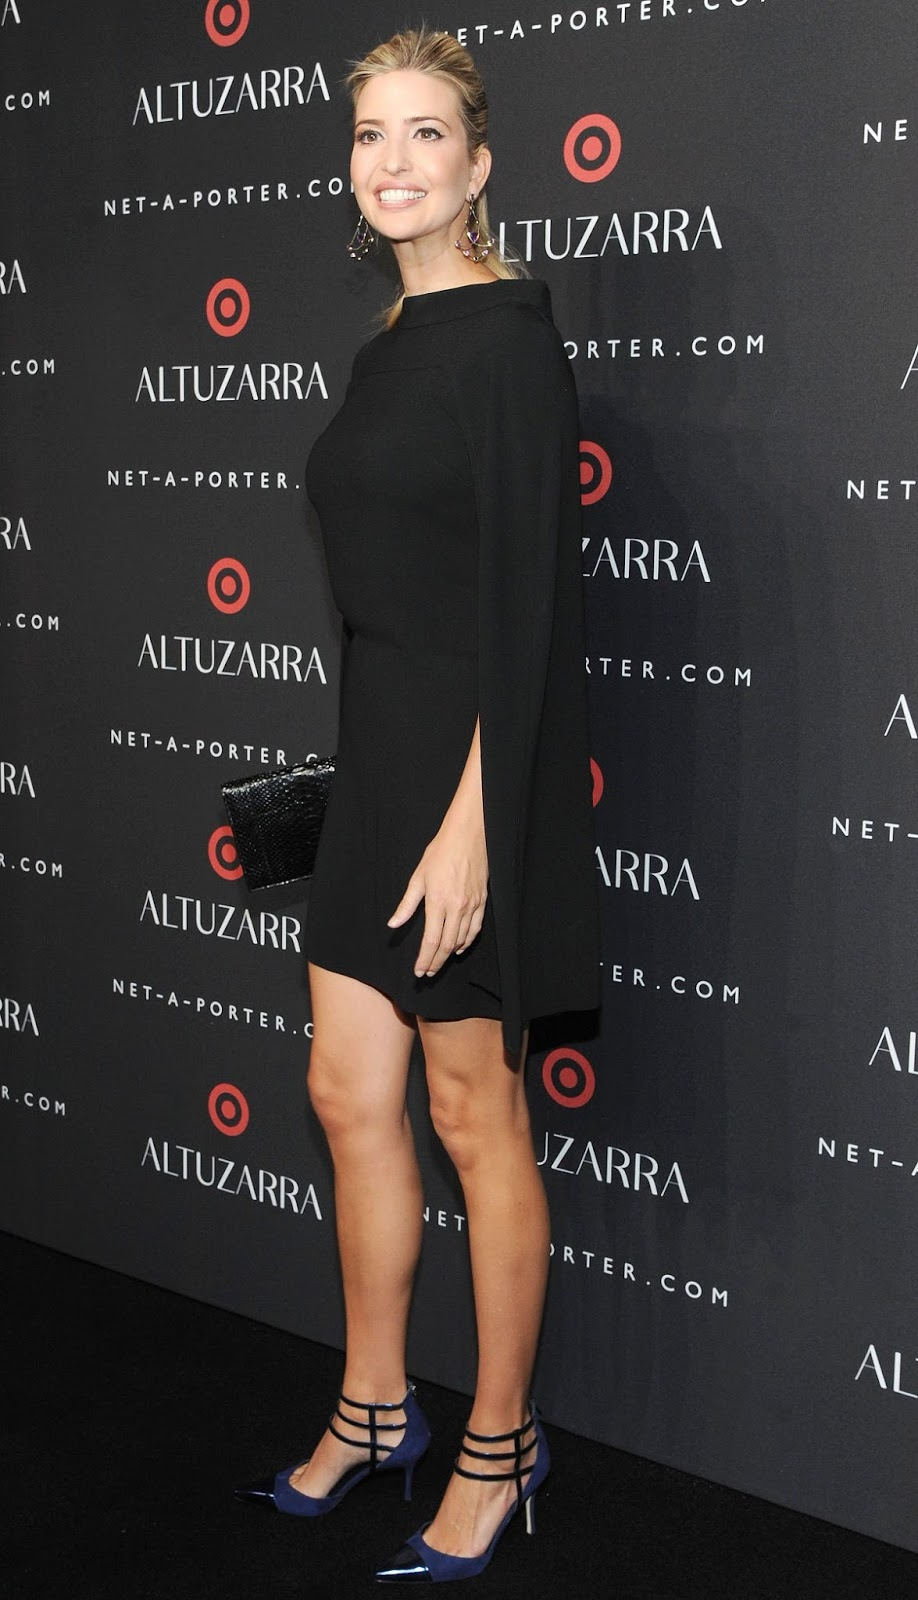 Photos of Ivanka Trump At Altuzarra For Target Launch Event In New York